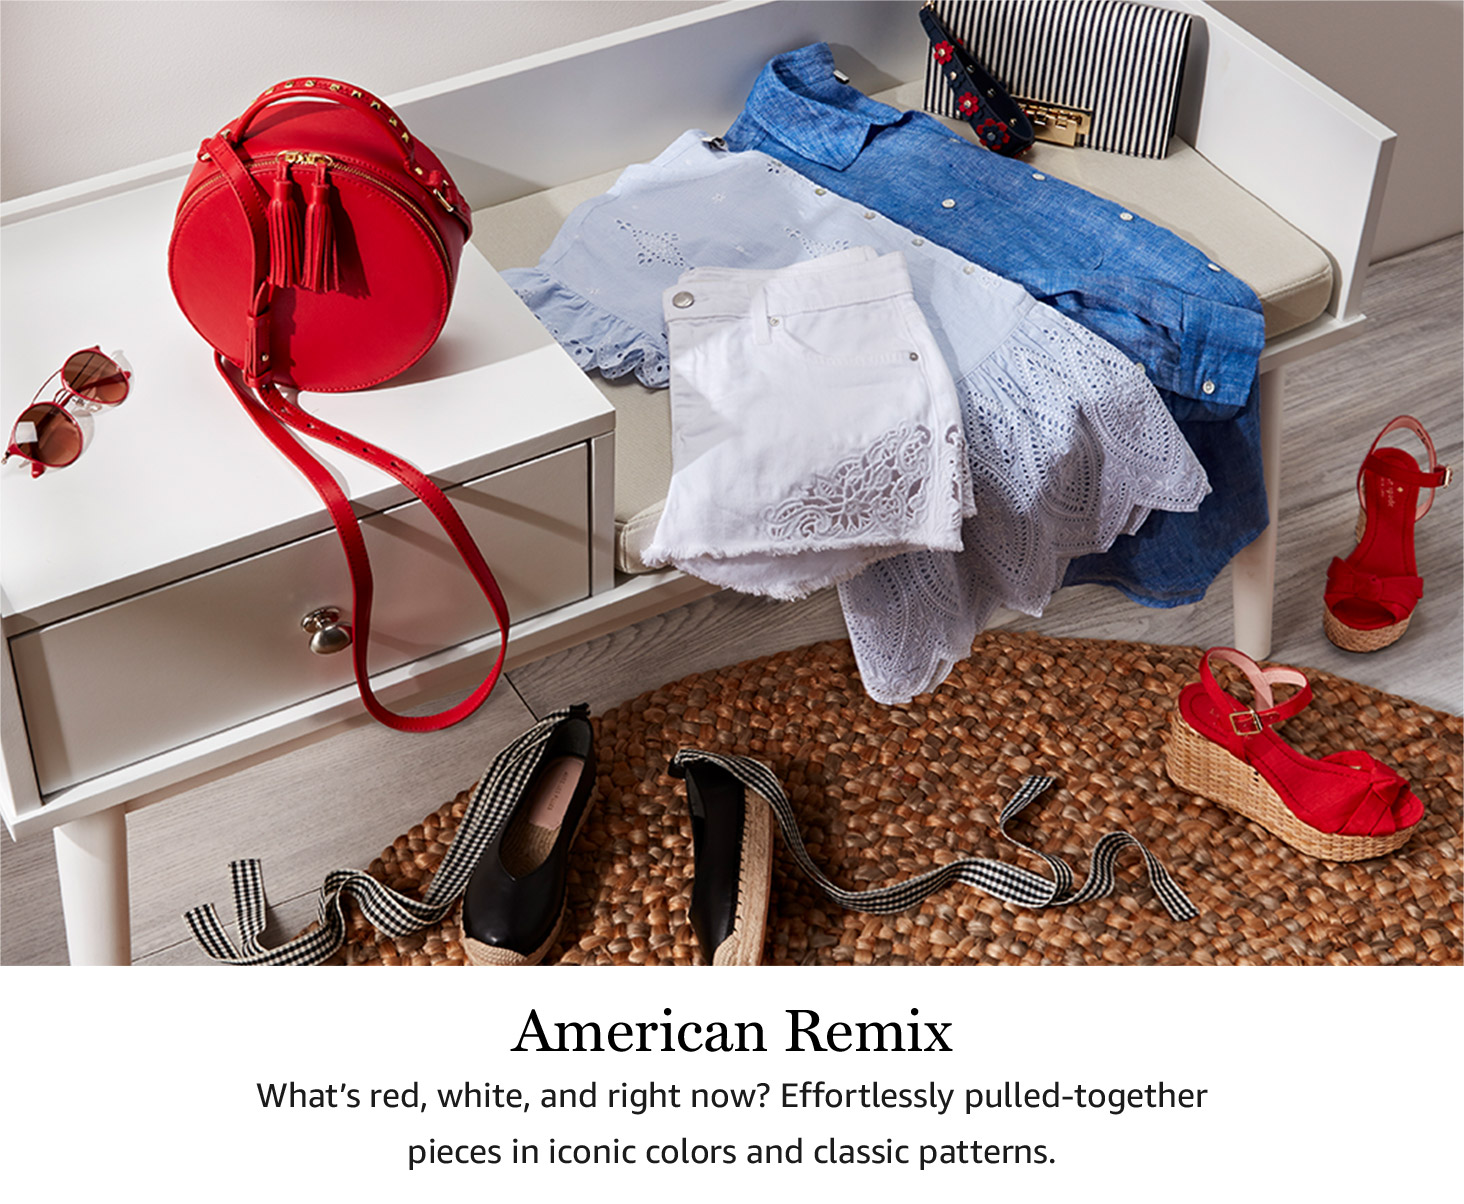 American Remix